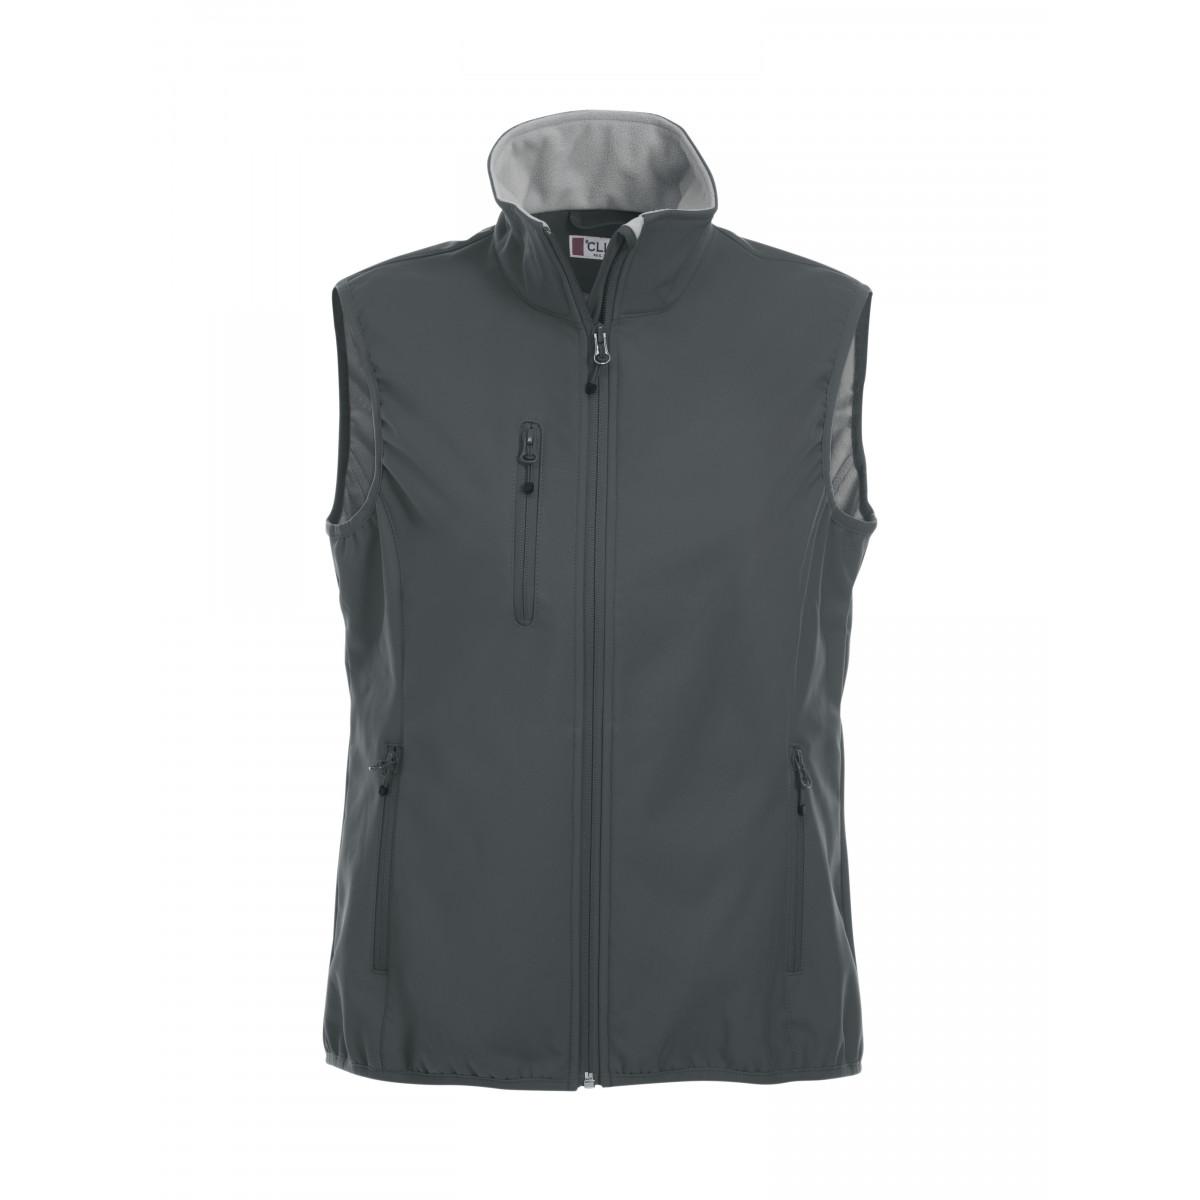 Жилет женский 020916 Basic Softshell Vest Ladies - Темно-серый